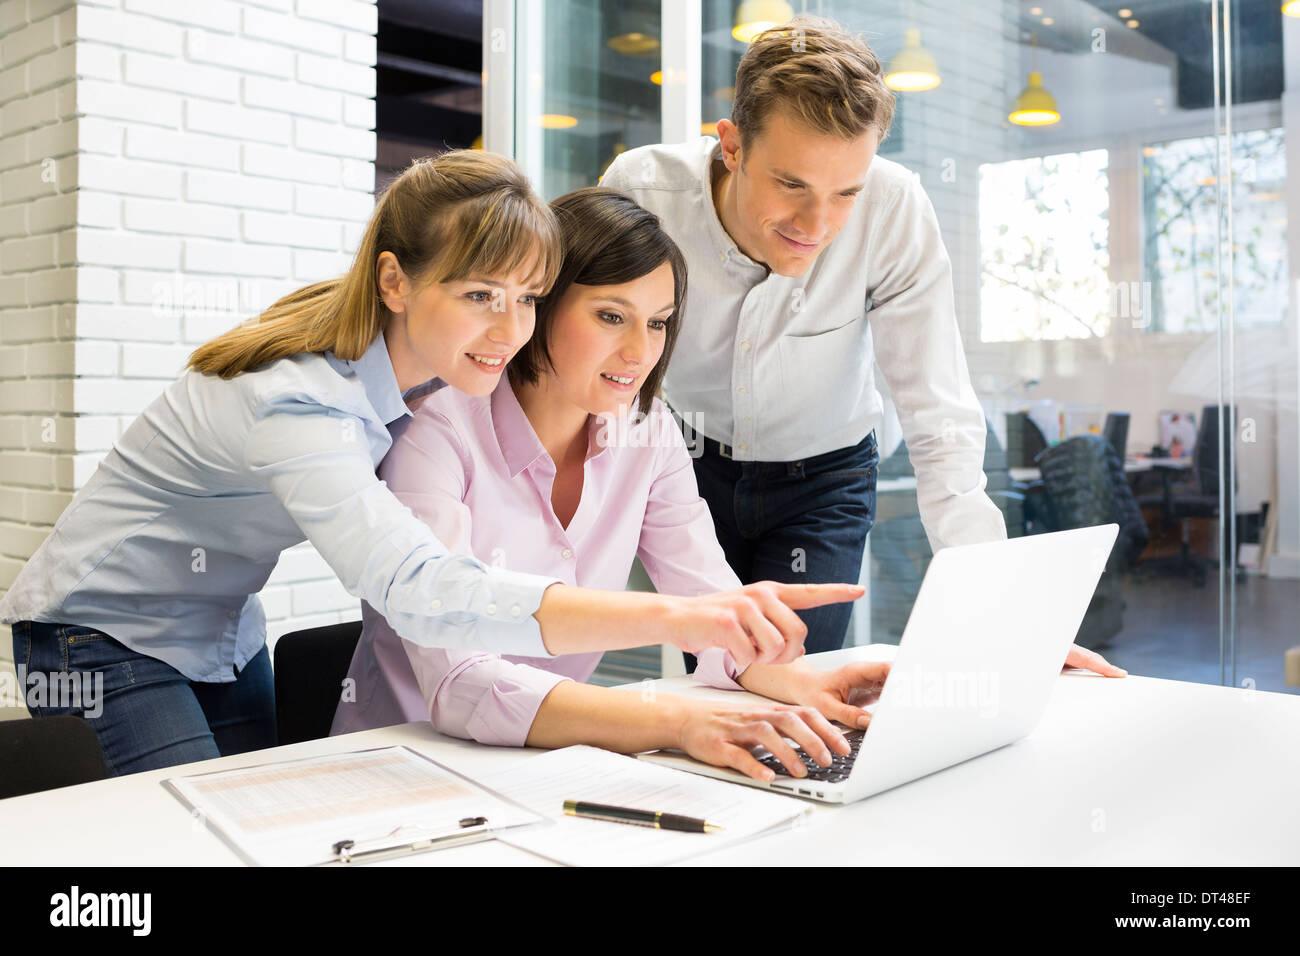 business man woman computer desk start-up - Stock Image